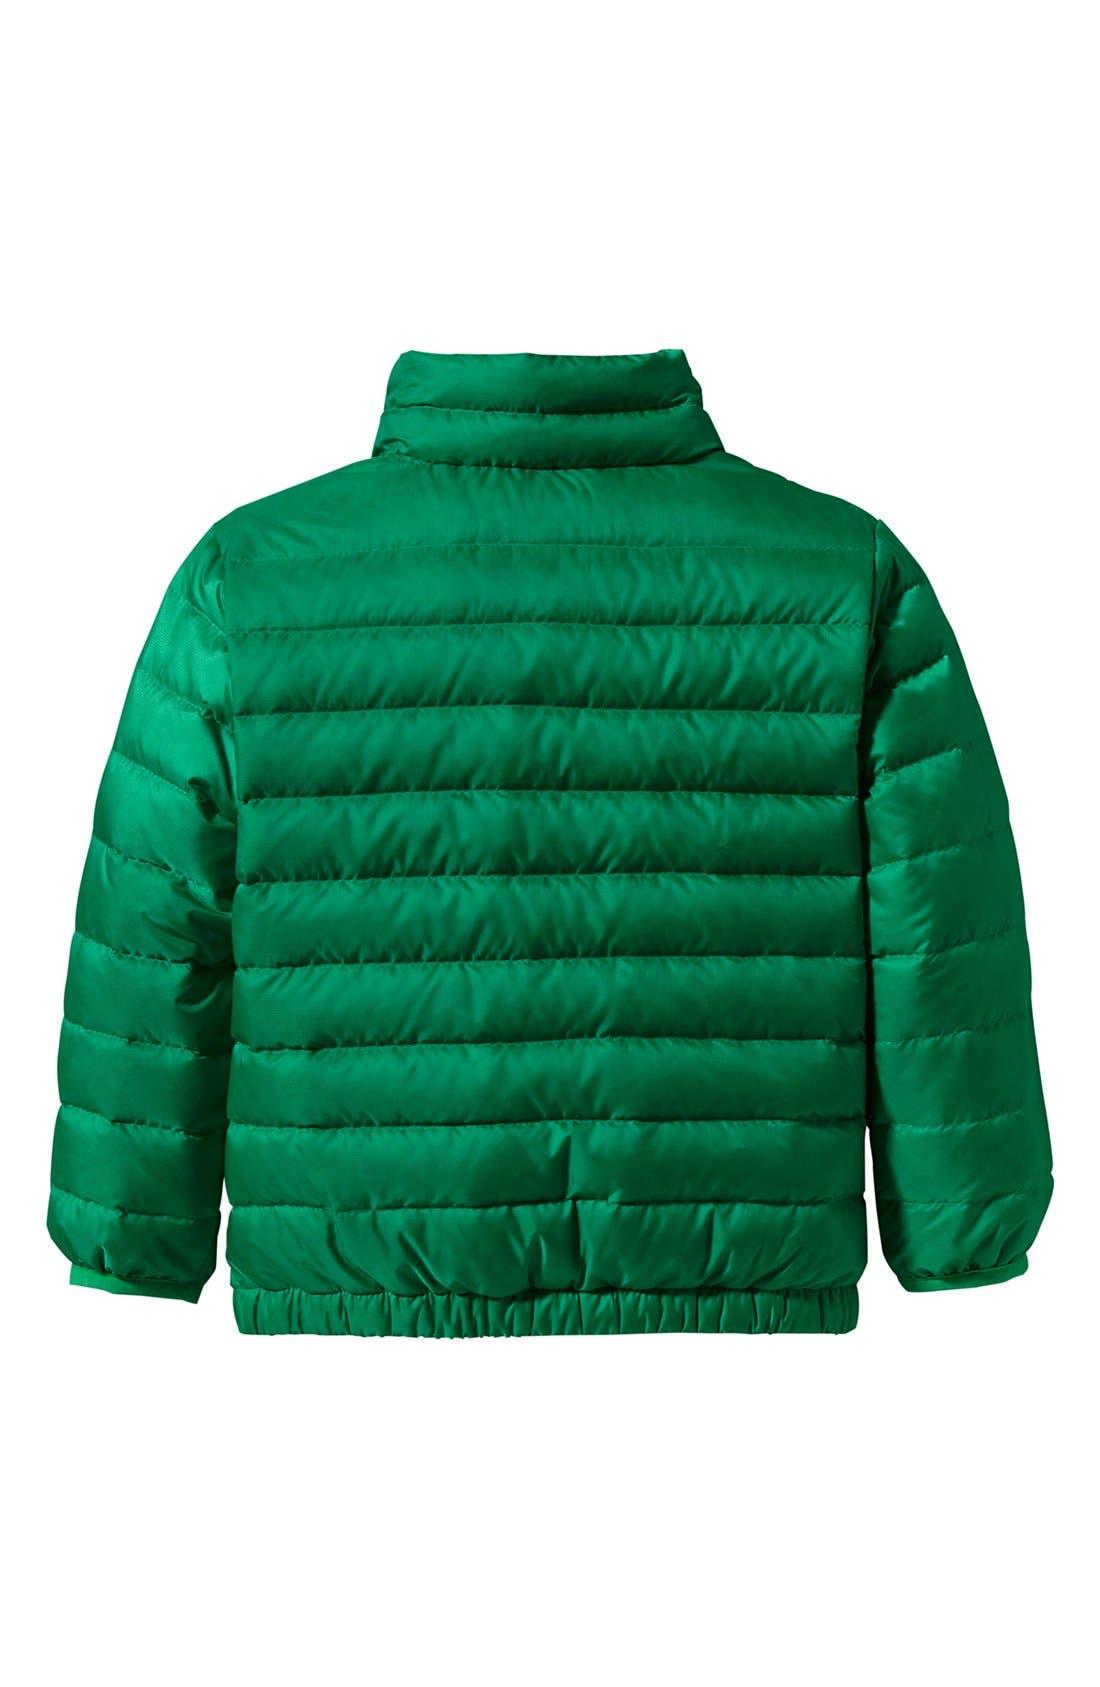 PATAGONIA,                             Down Sweater Jacket,                             Alternate thumbnail 2, color,                             300